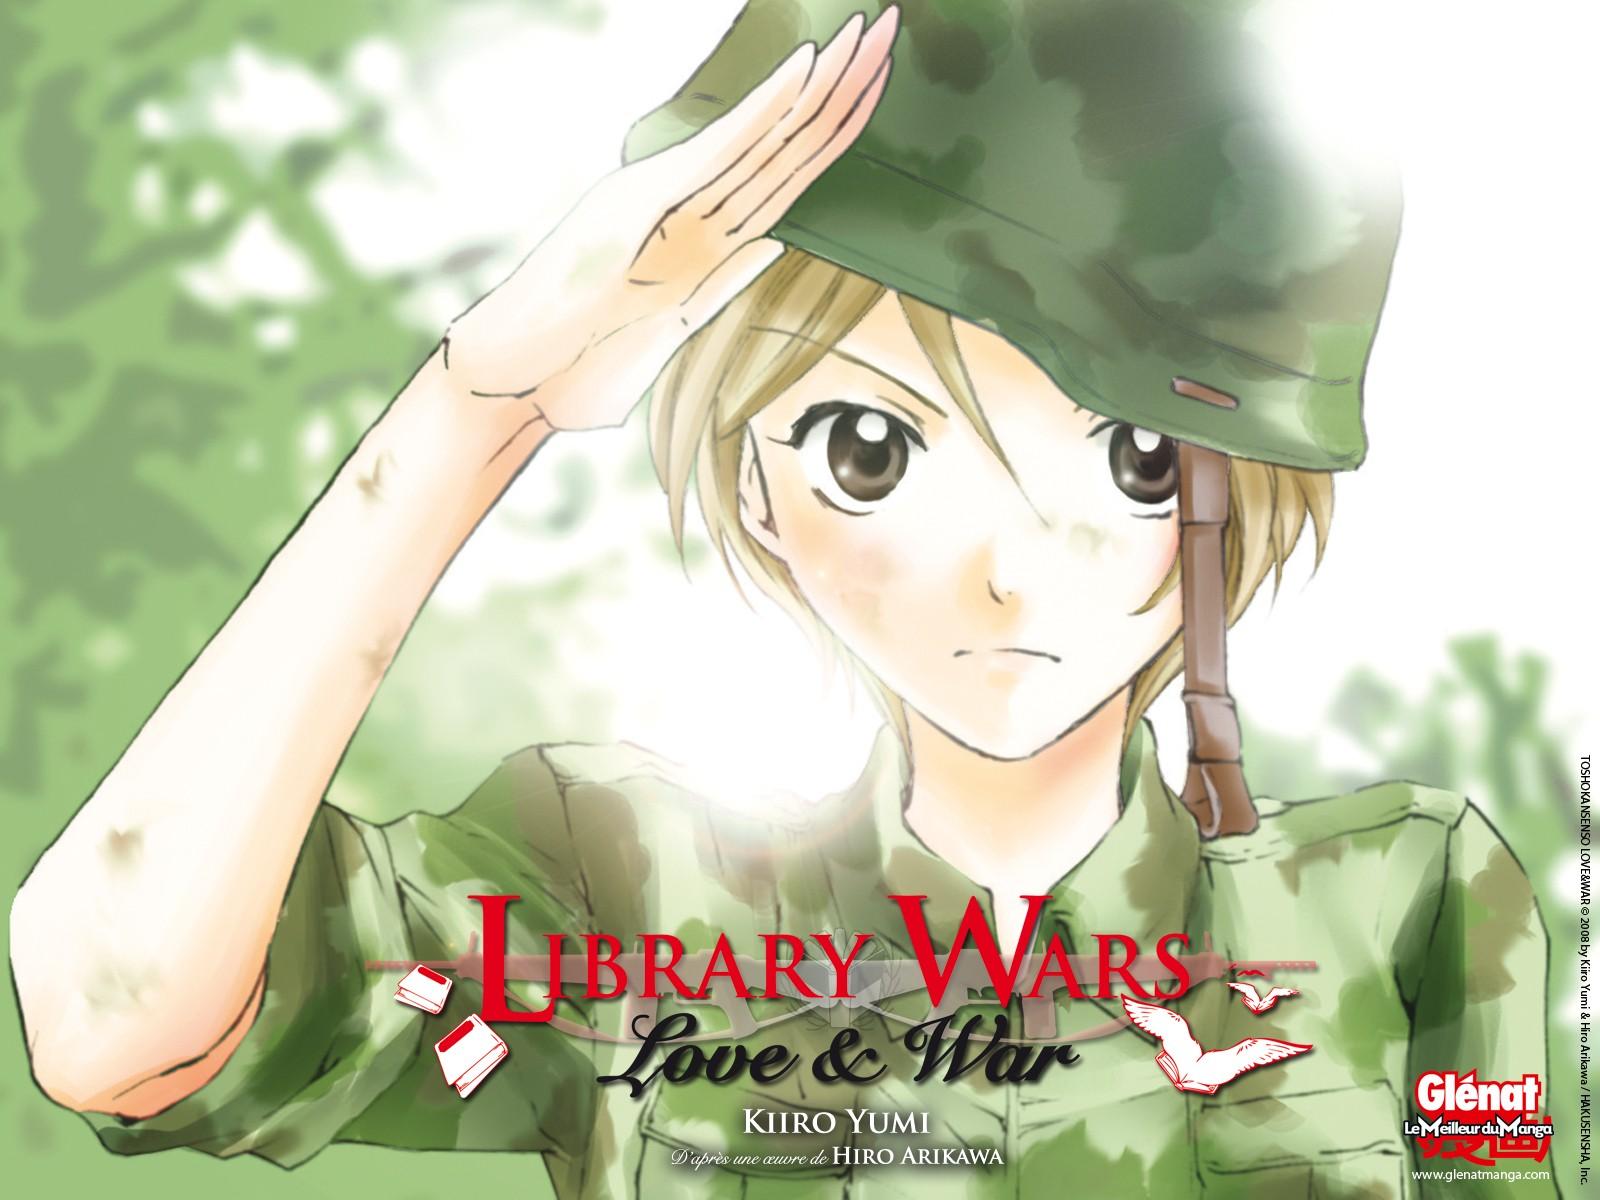 Library wars fond ecran2 1600x1200